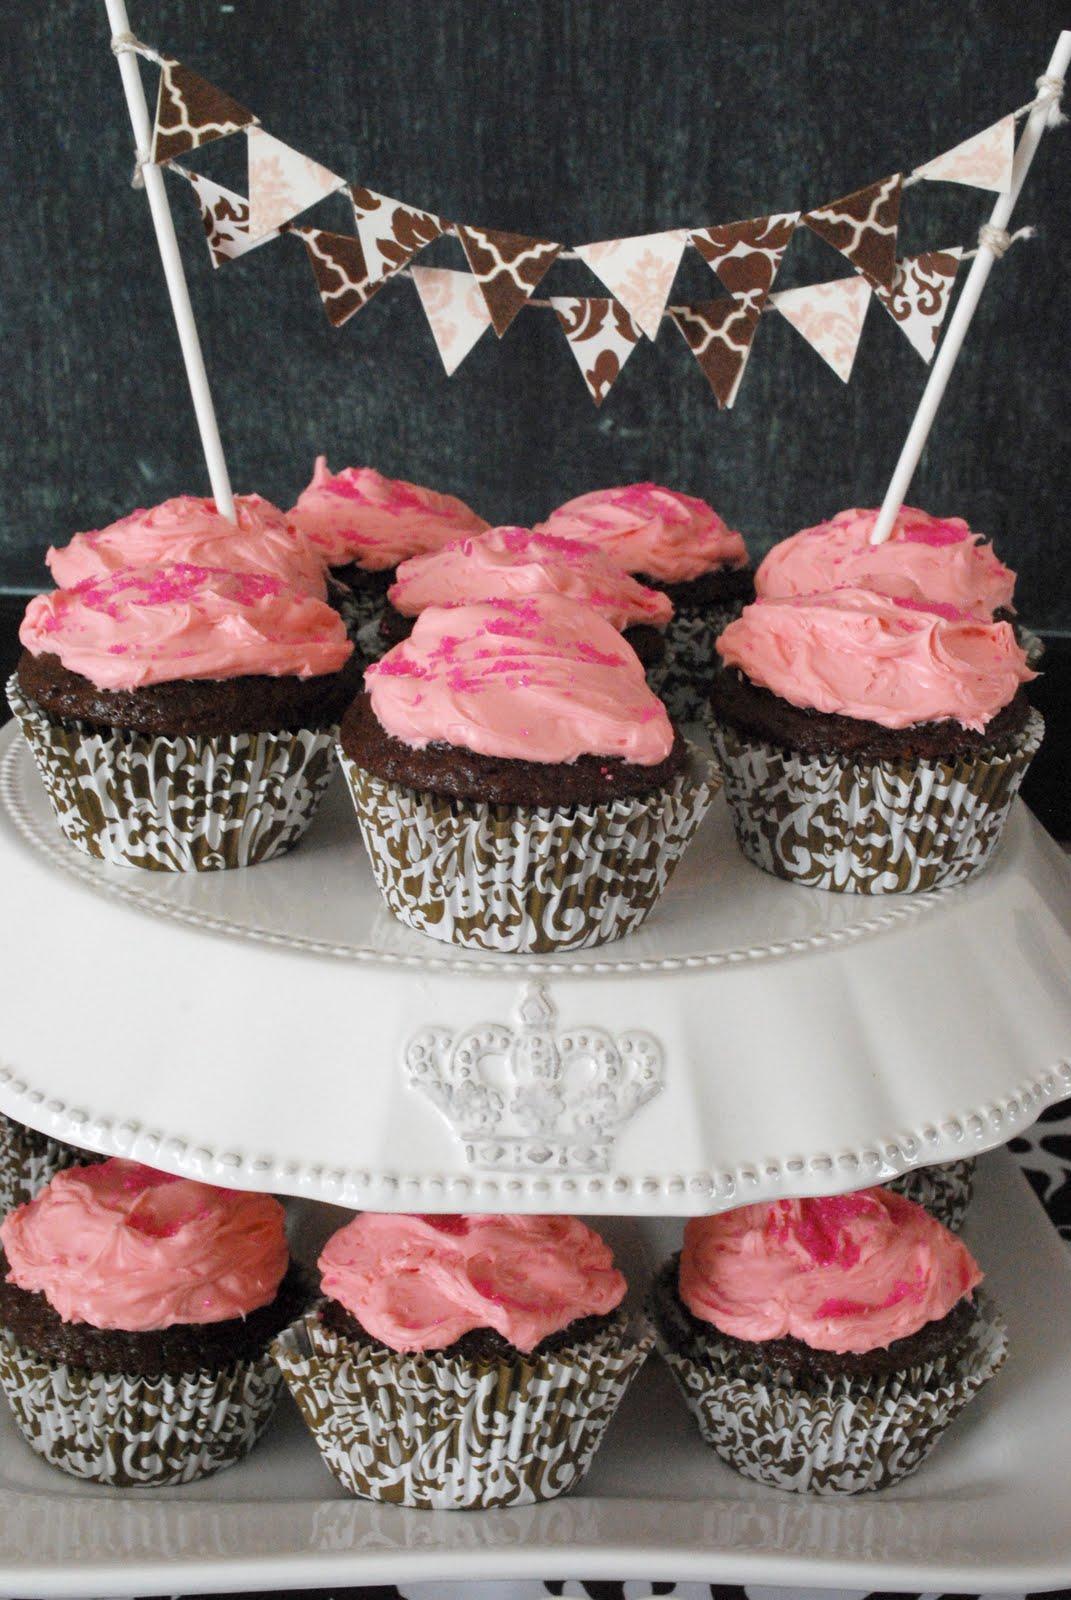 http://1.bp.blogspot.com/-mSRwPoimmh0/TXSIOuaEJII/AAAAAAAAHzY/iZpgvsKdkRs/s1600/cupcakesandpennants.jpg